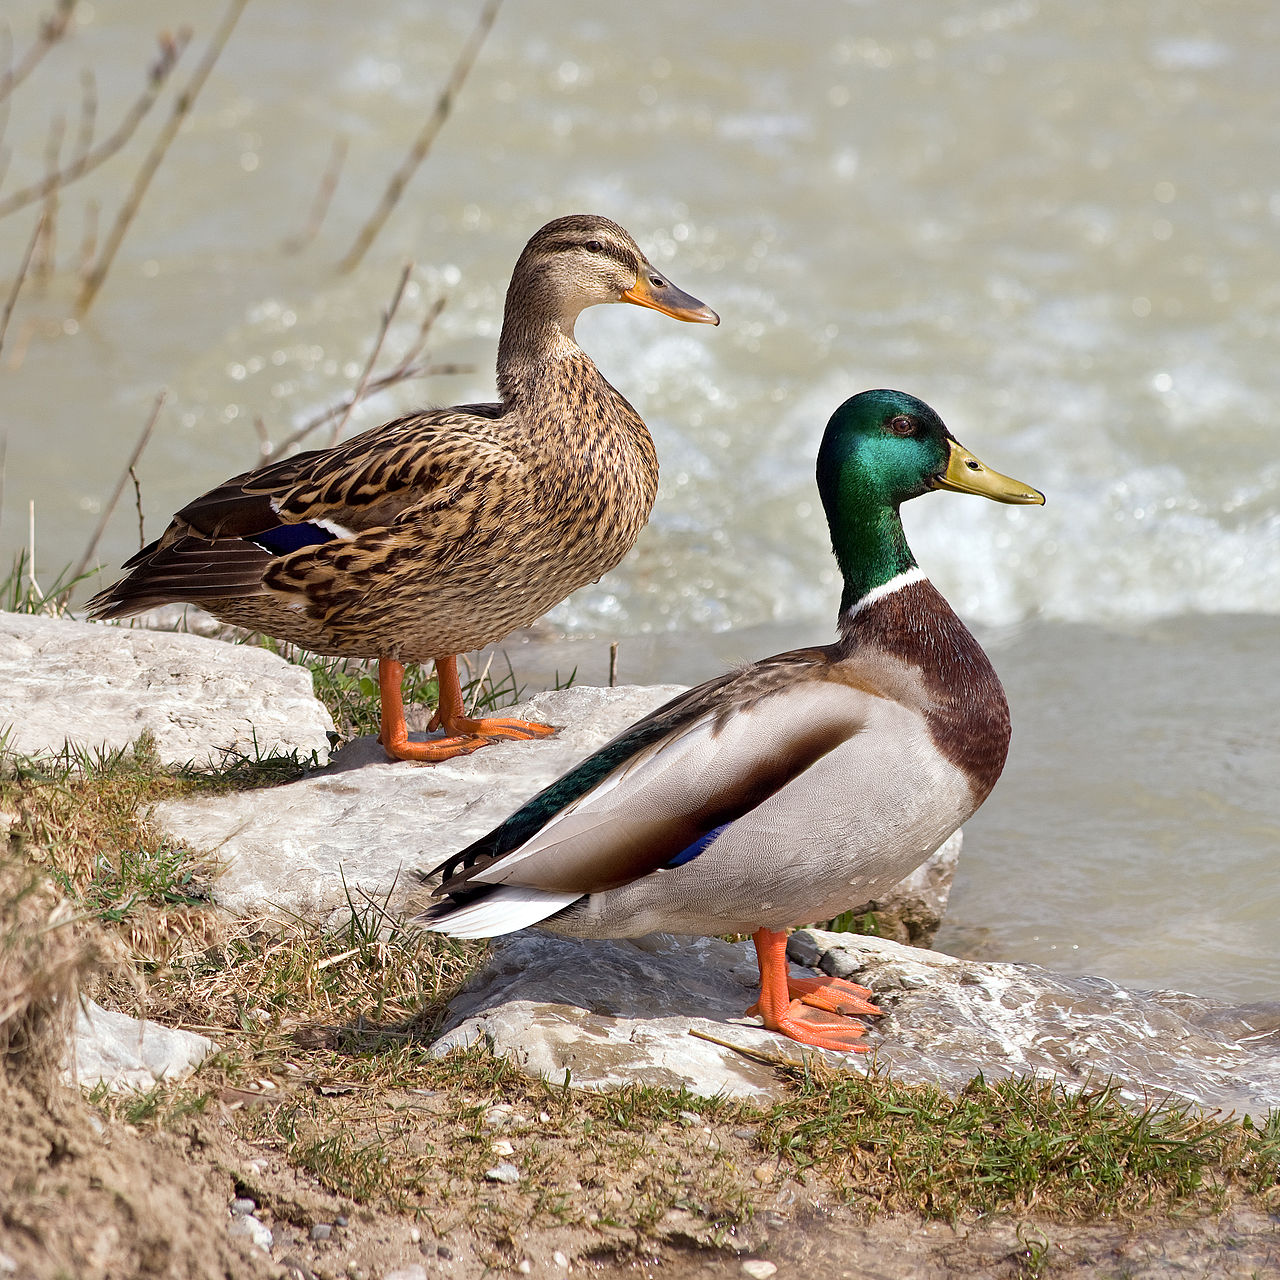 Female (left) and male (right) mallards.